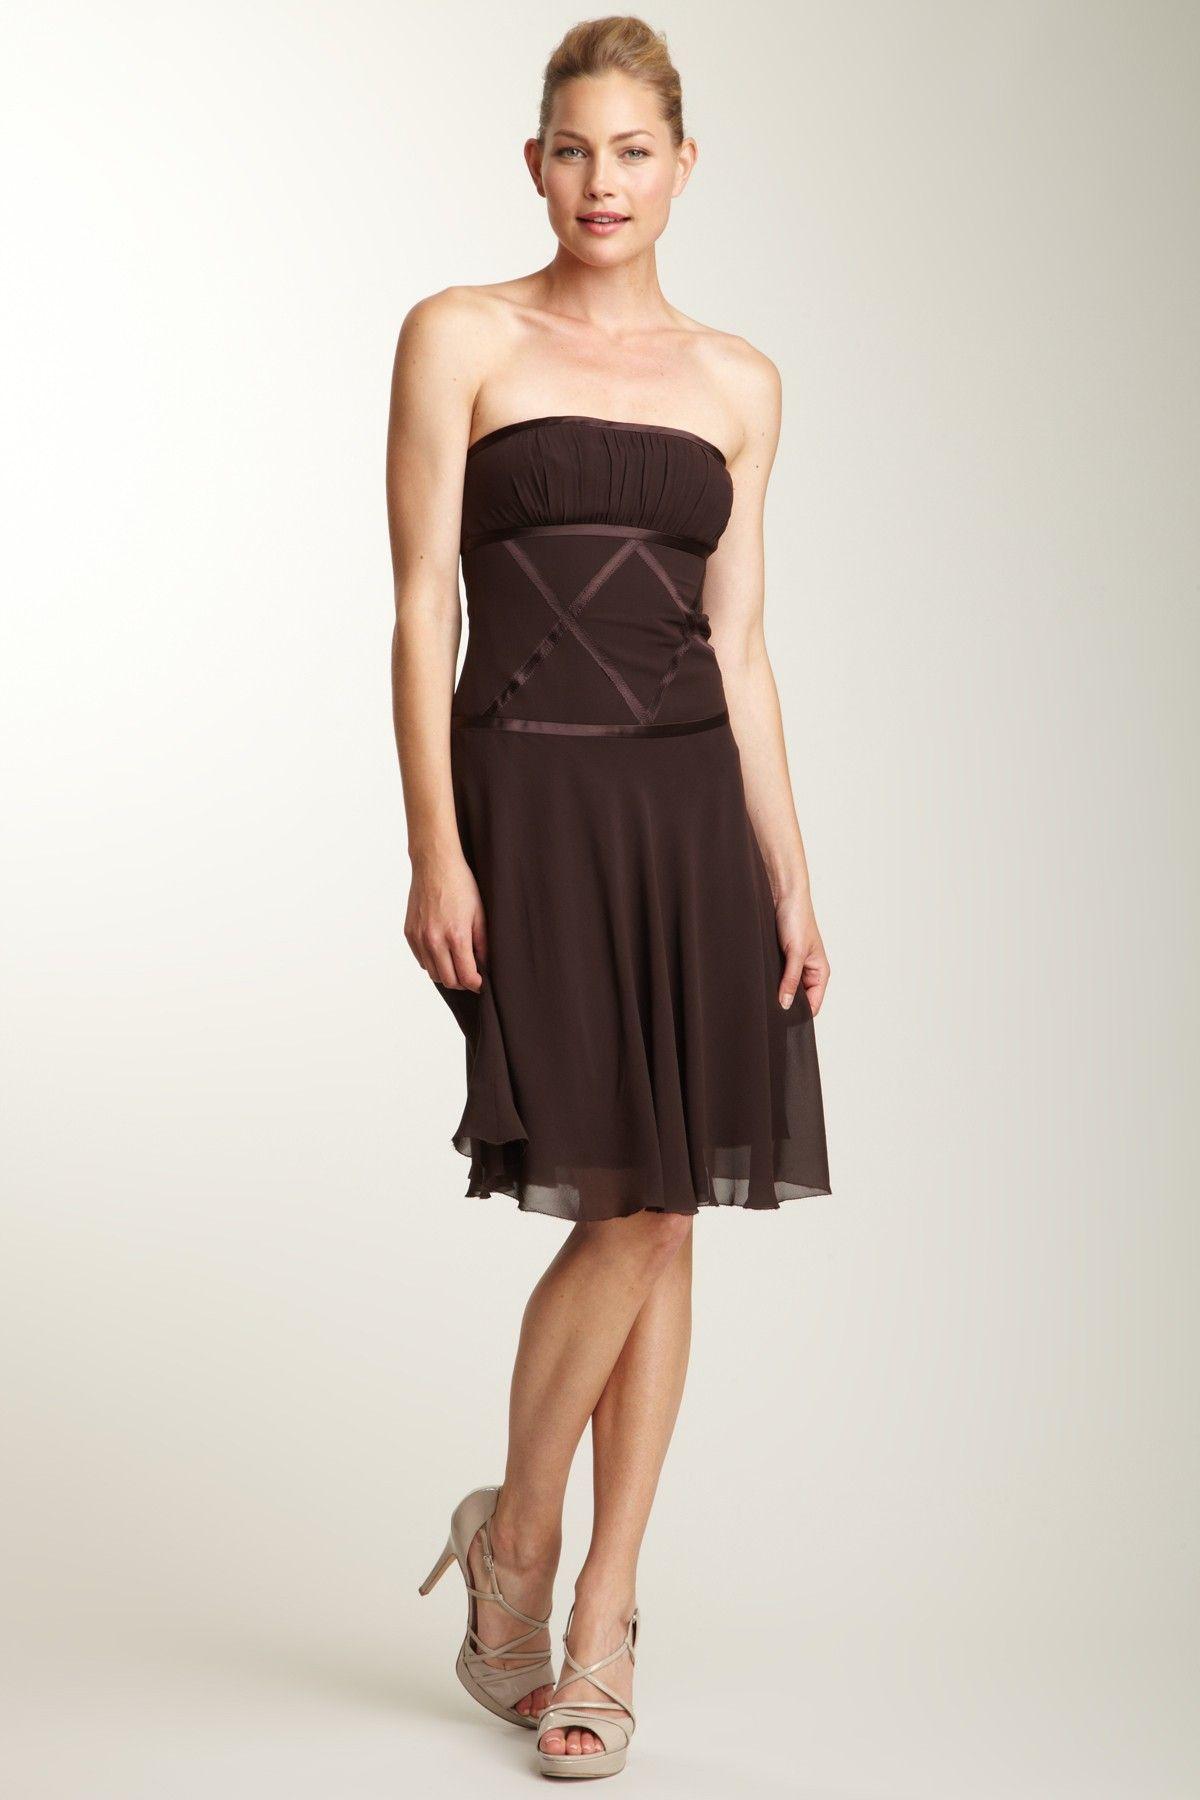 Nicole miller couture evening dress beauty dress dresses